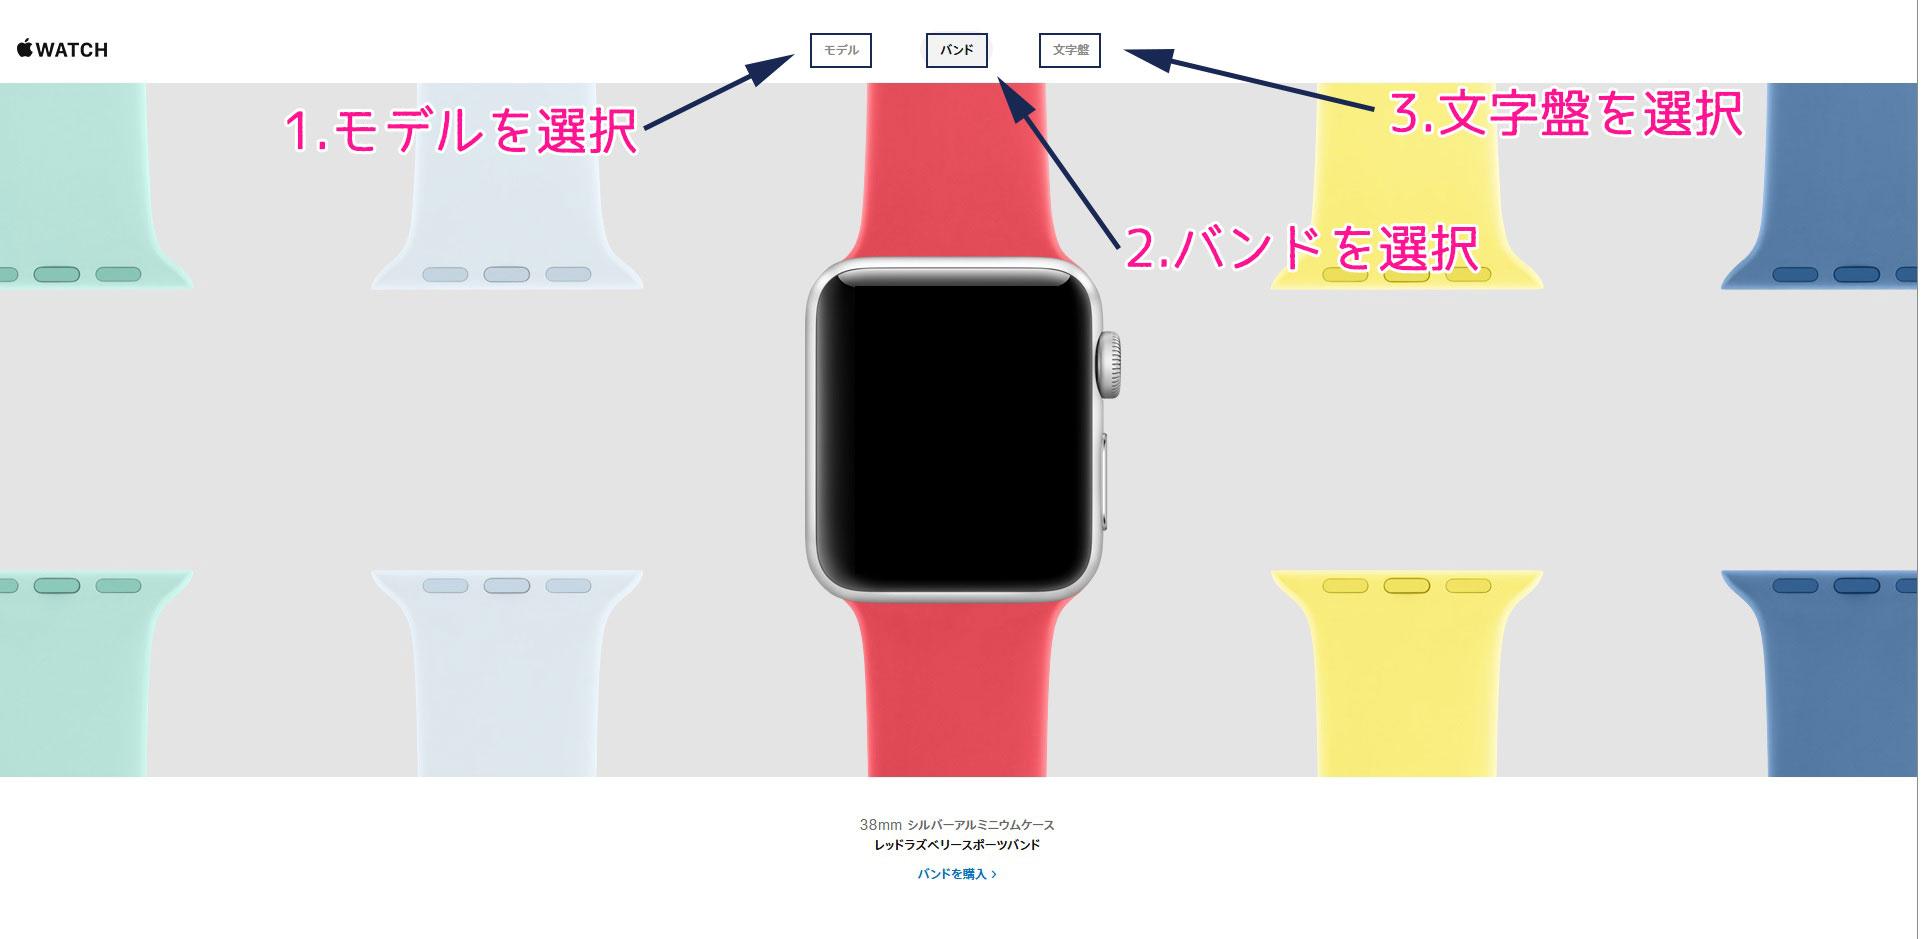 AppleWatch インタラクティブギャラリー